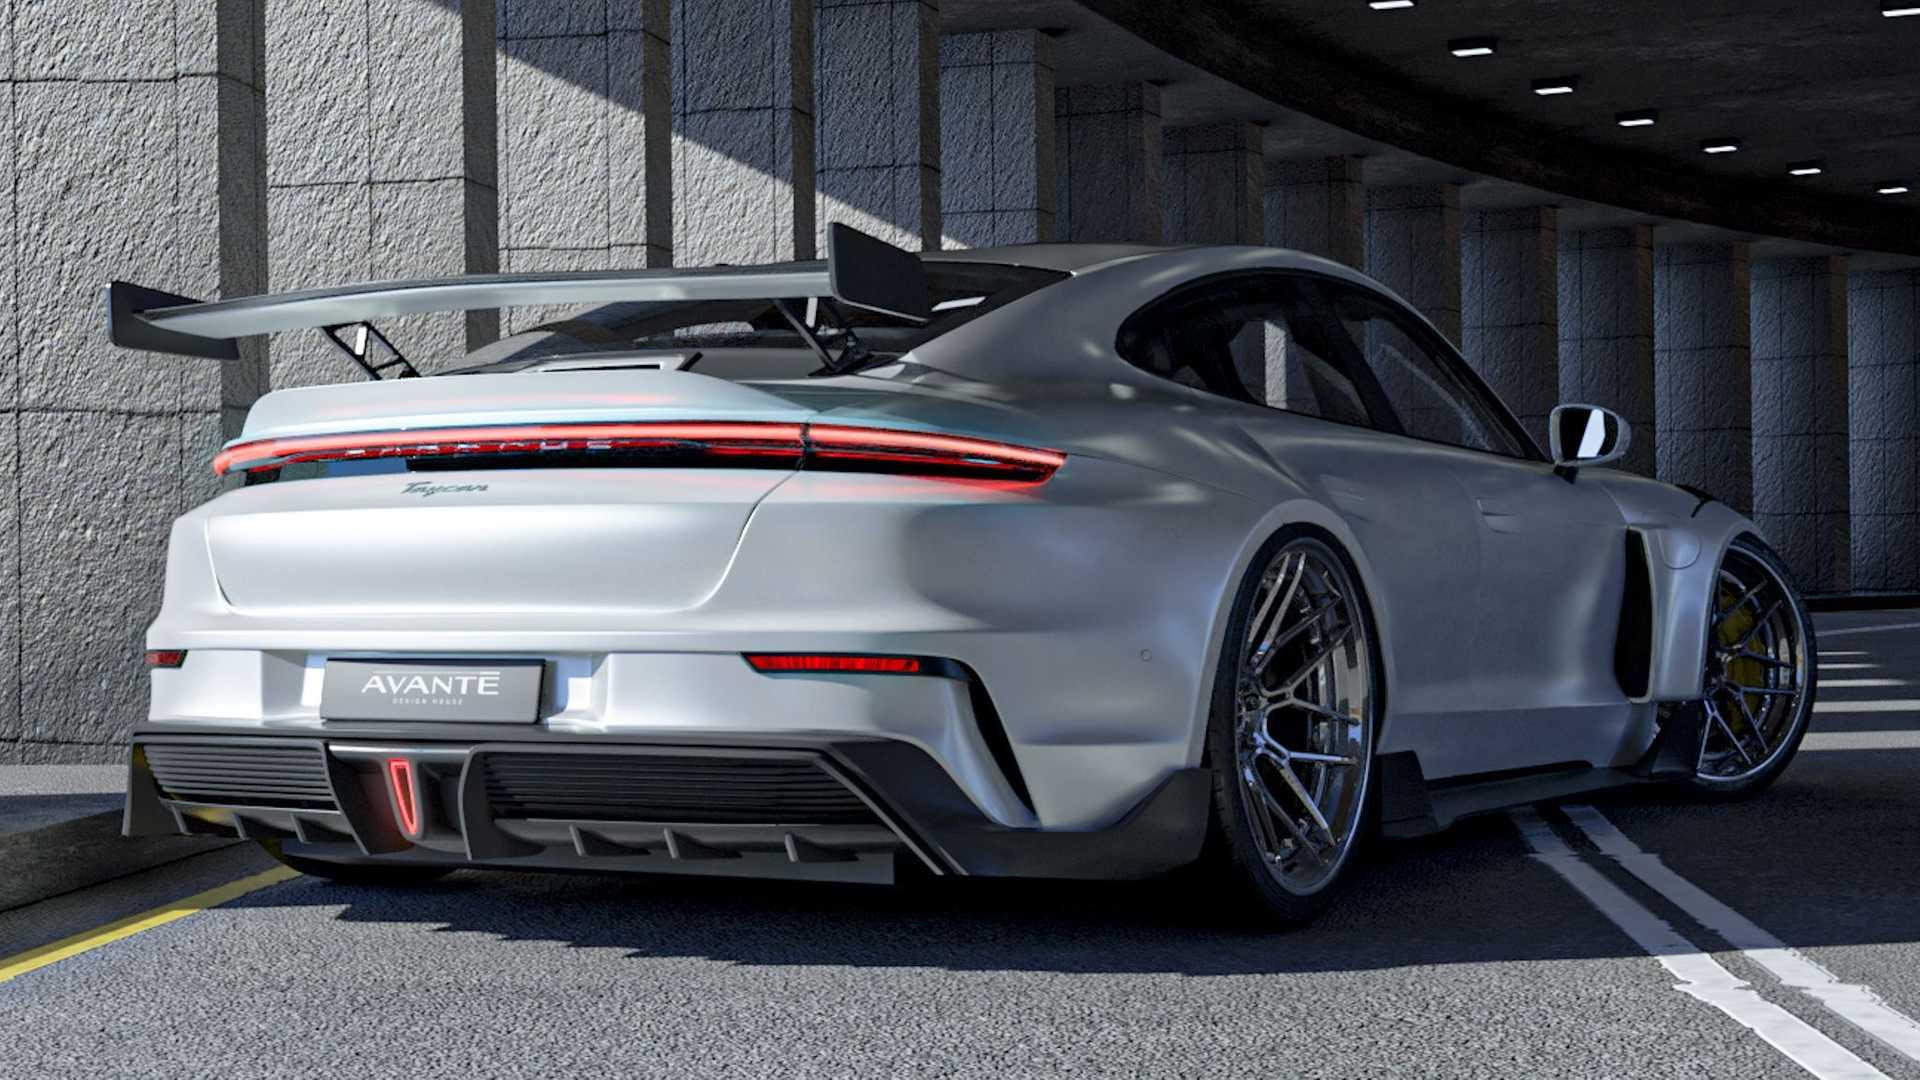 Porsche-Taycan-by-Avante-Design-3